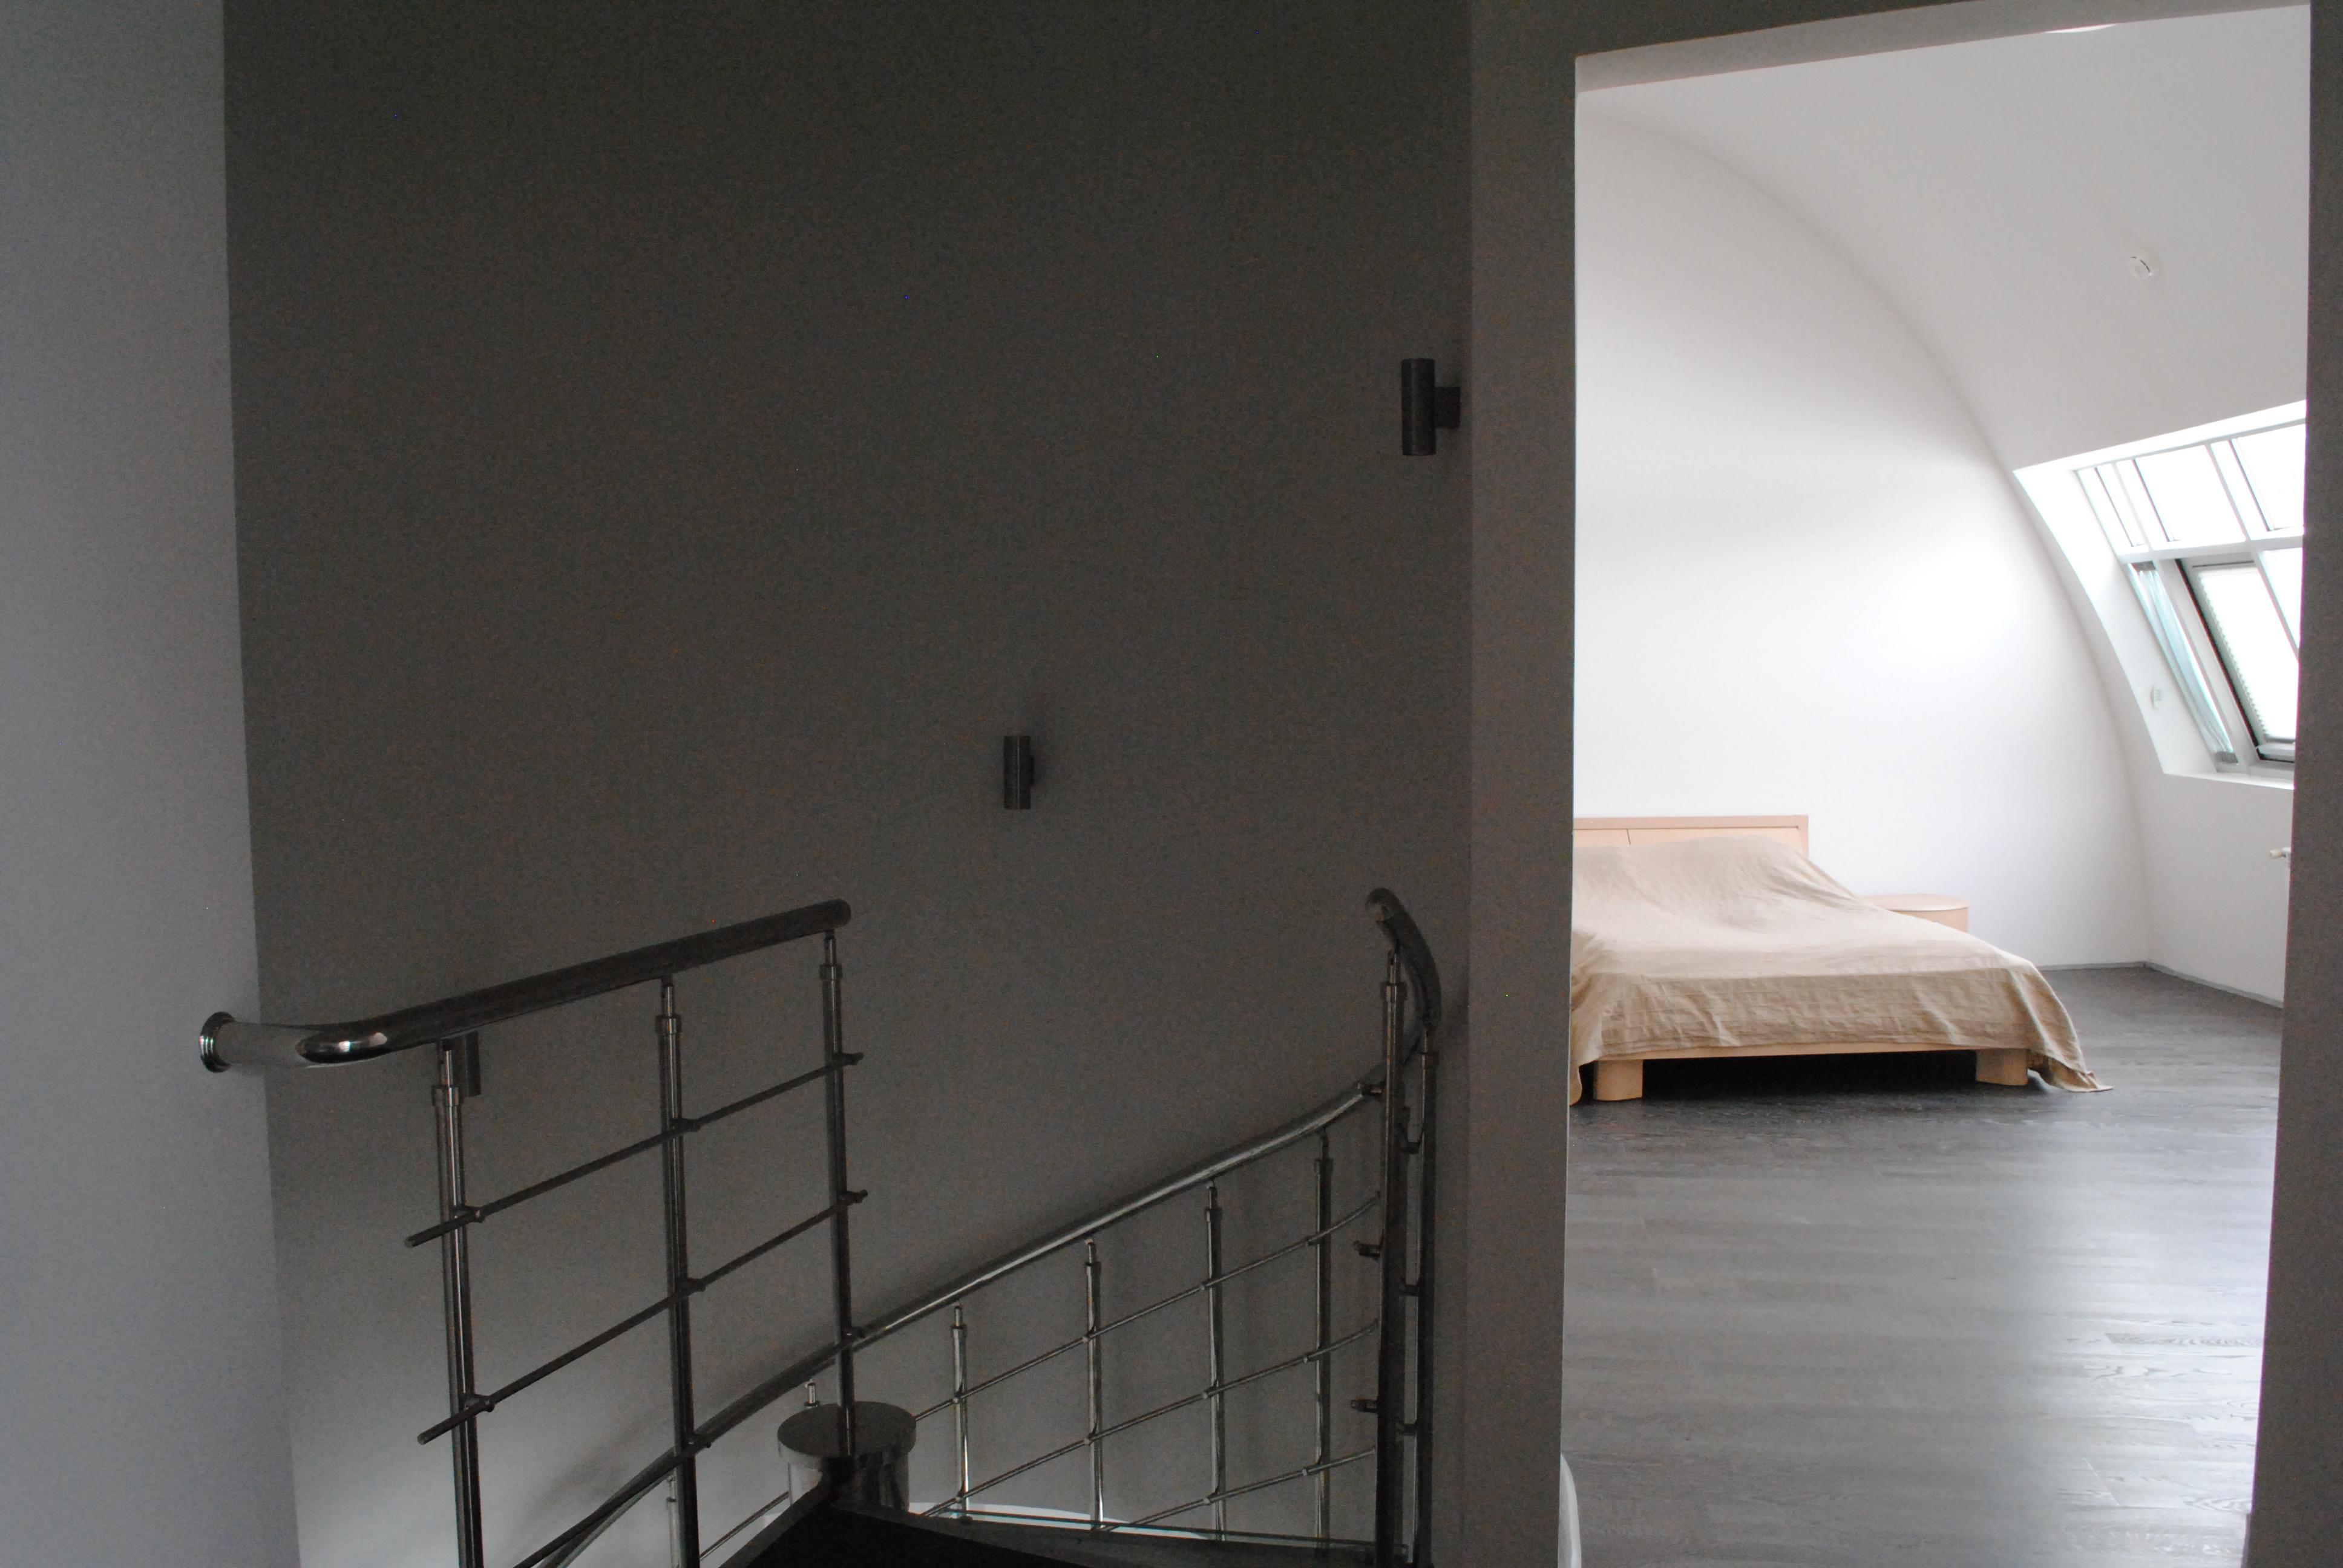 Апартамент №2 (2эт.) лестничный холл